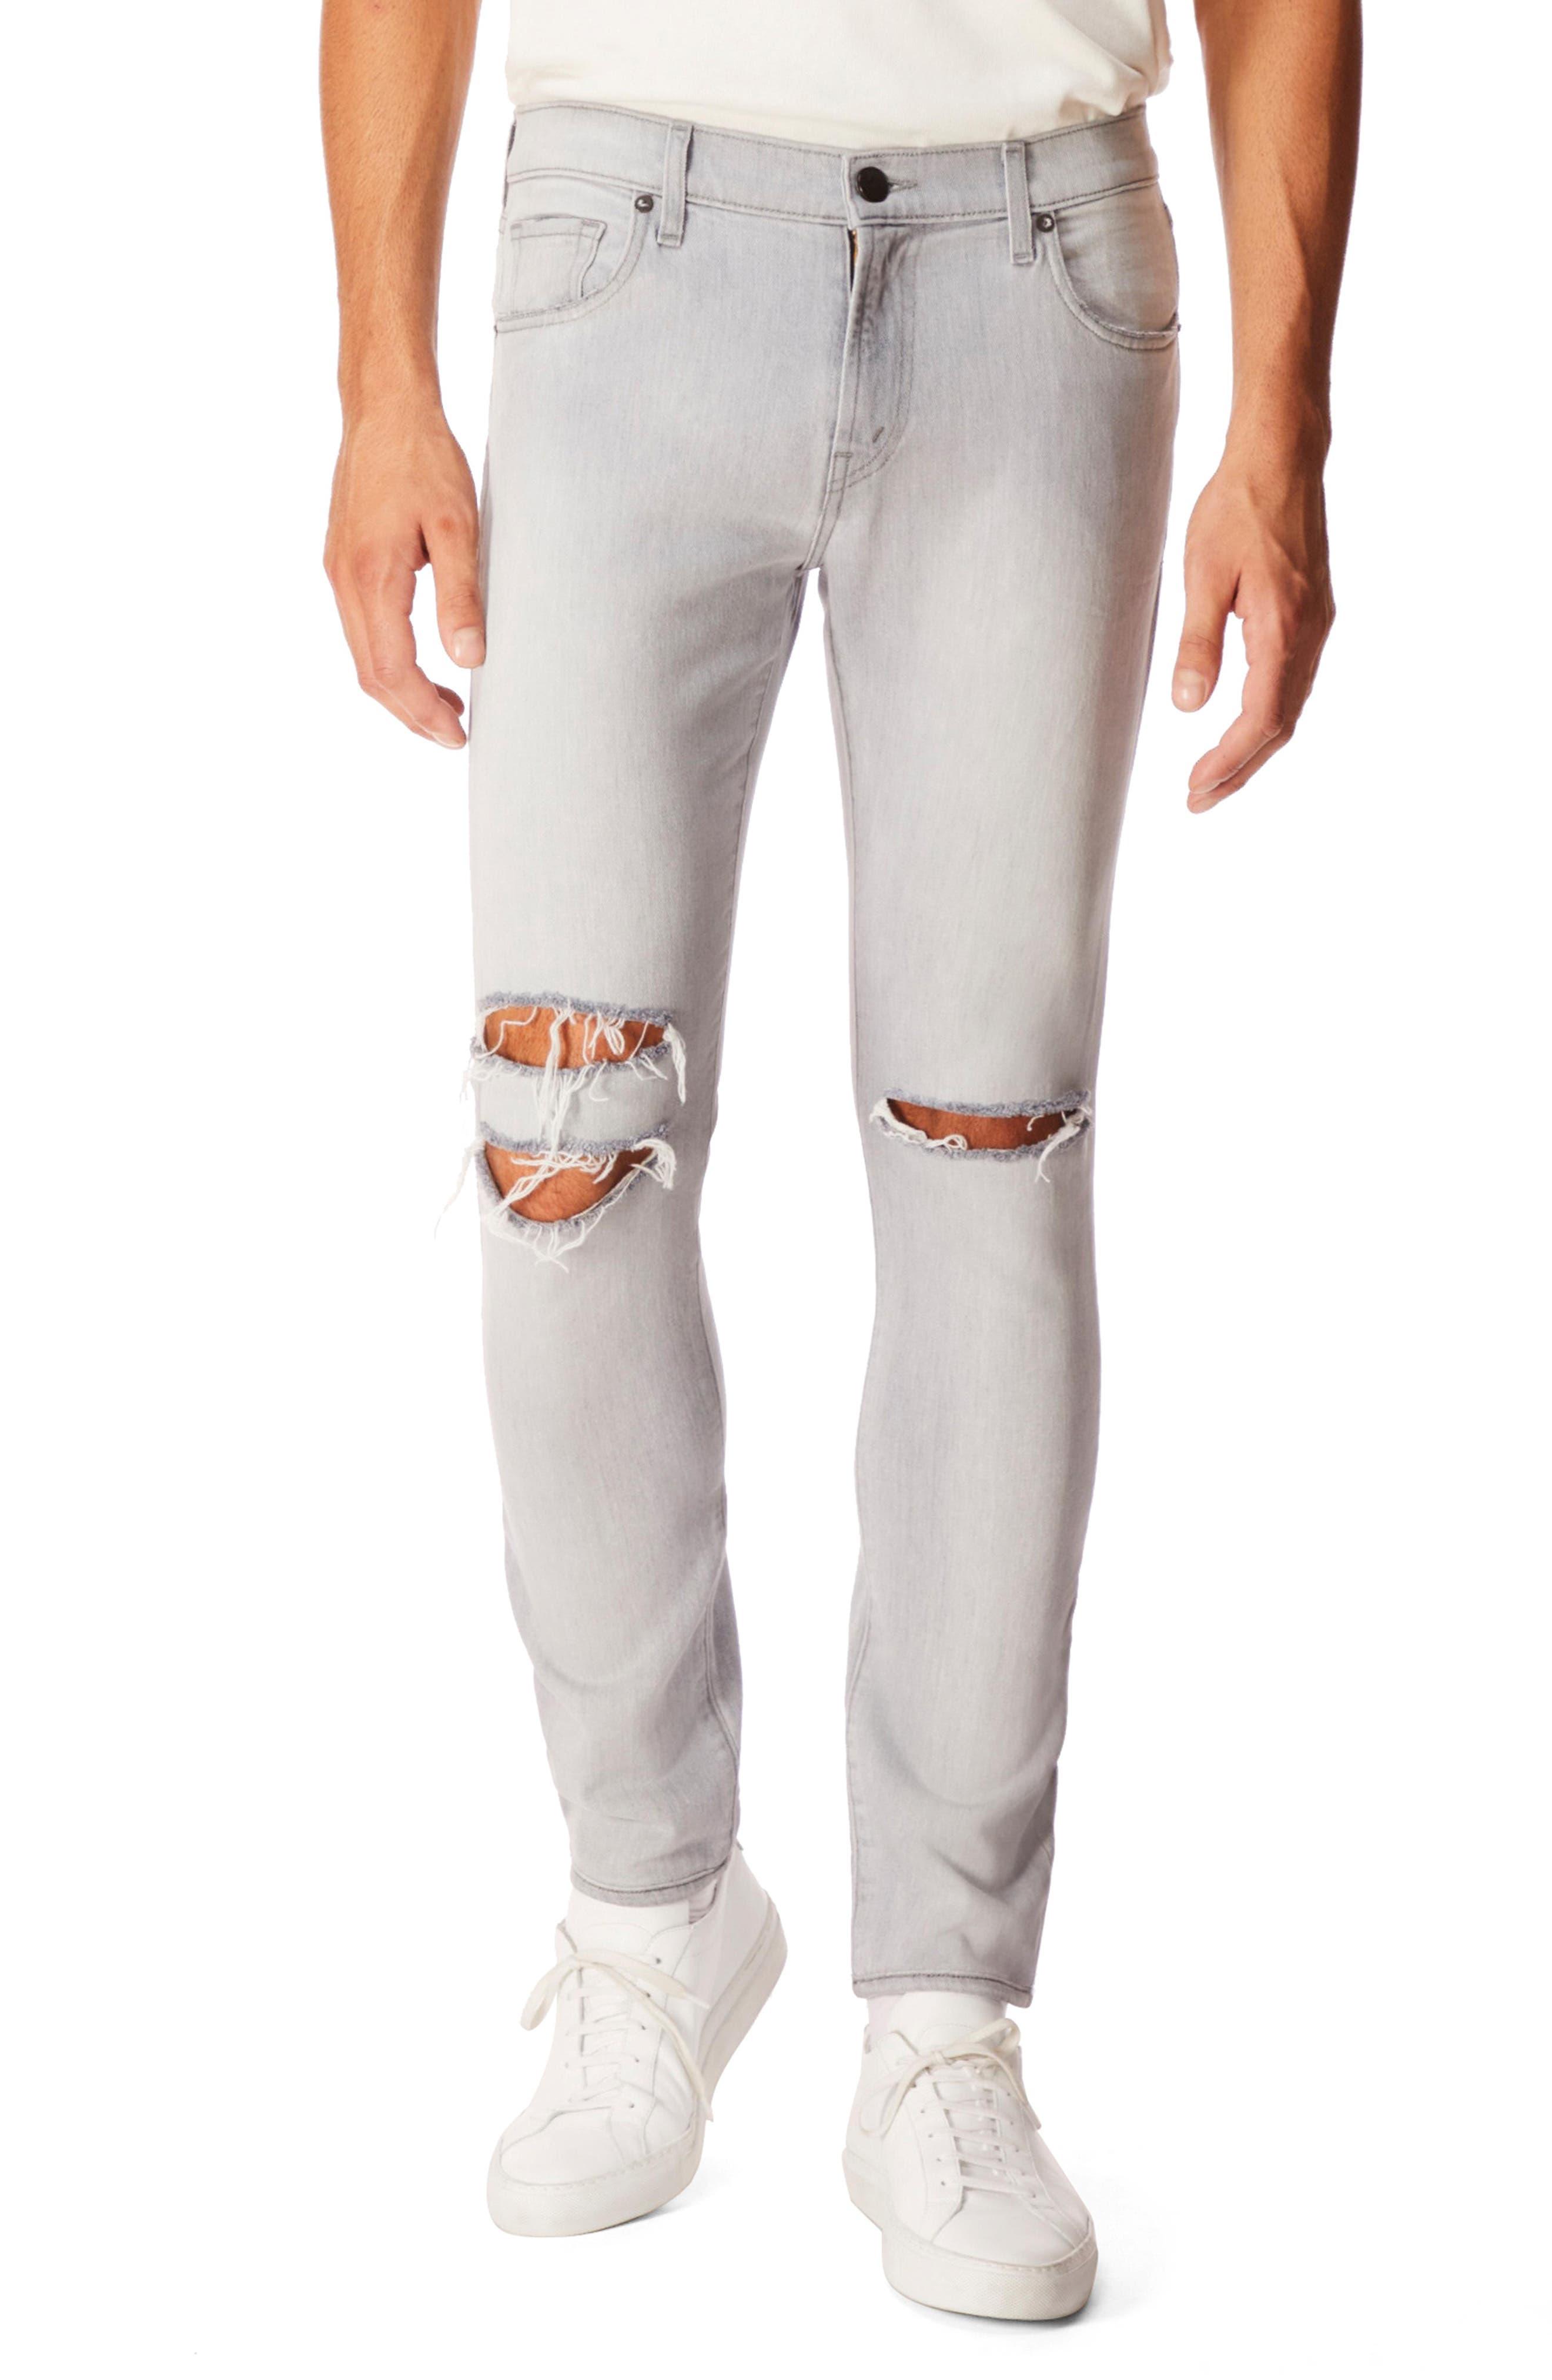 J Brand Jeans Mick Skinny Fit Ripped Jeans